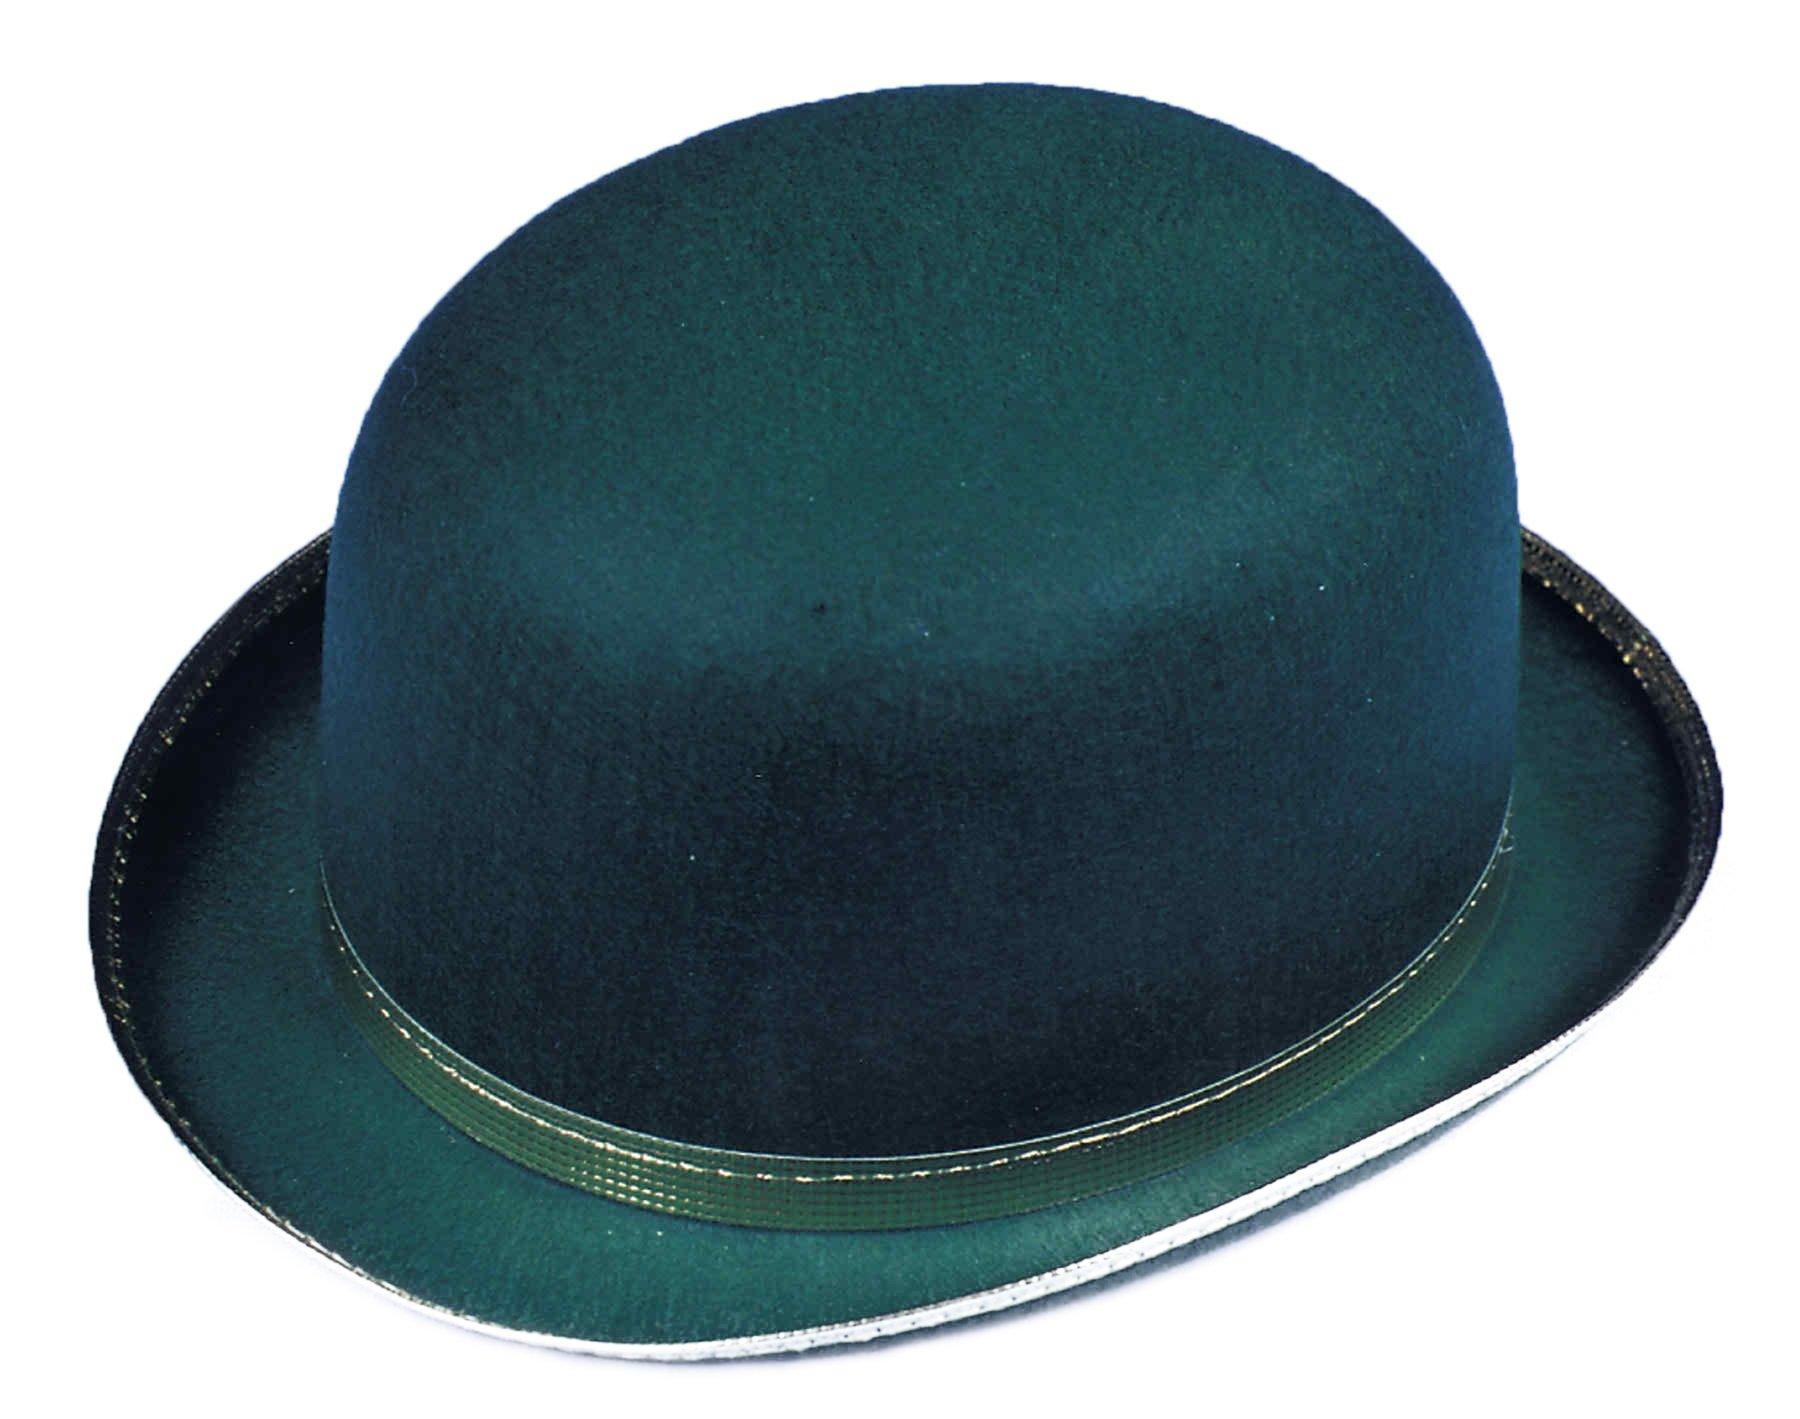 UHC Adult Men's Bowler Derby Felt Top Hat Halloween Costume Accessory (Green), L